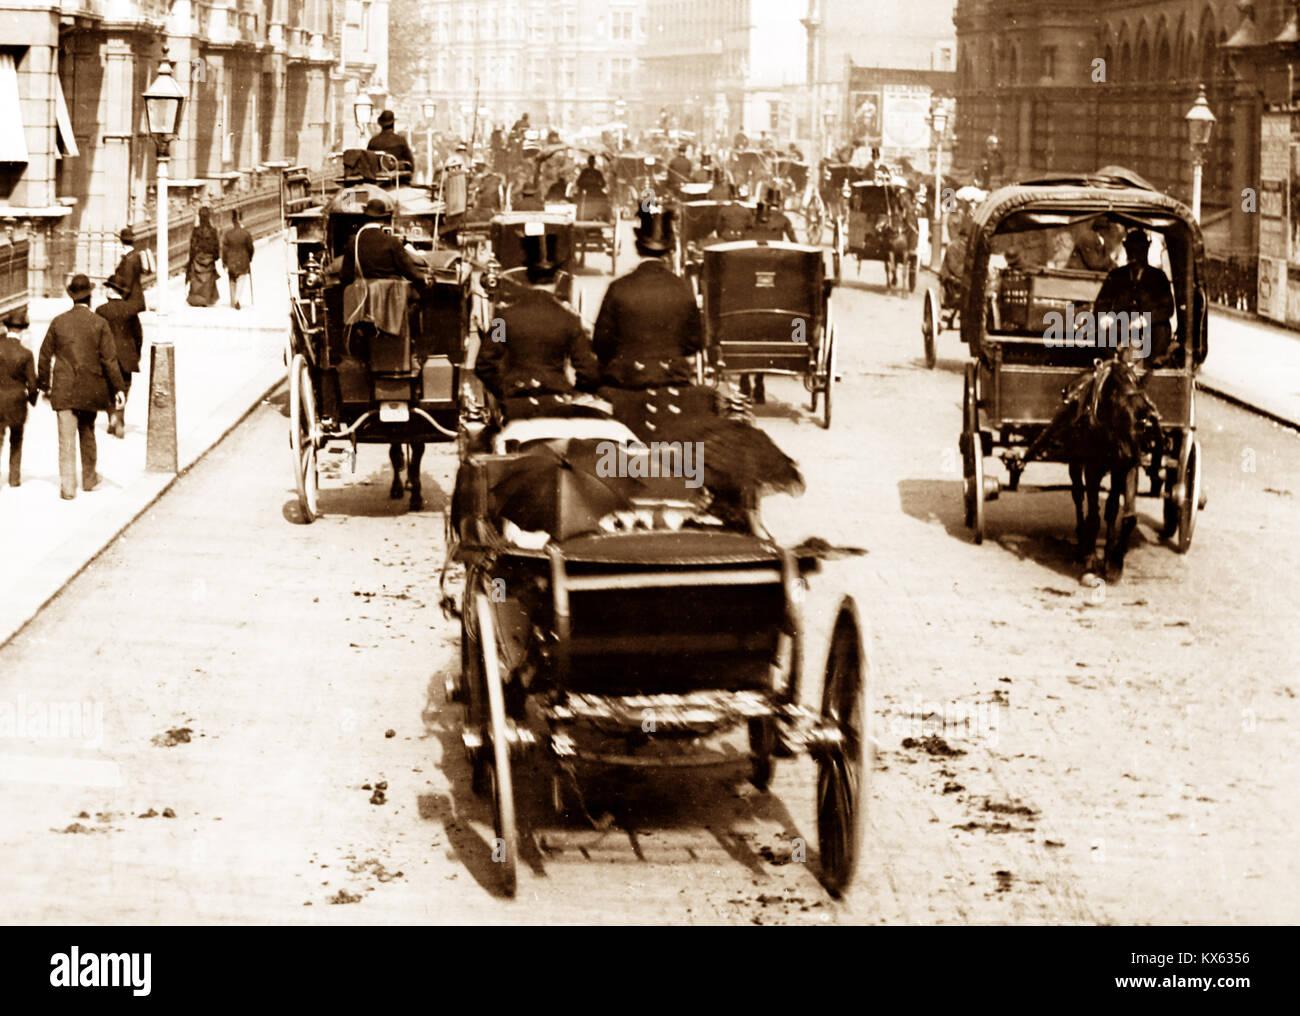 Victoria Street, London, Victorian period - Stock Image